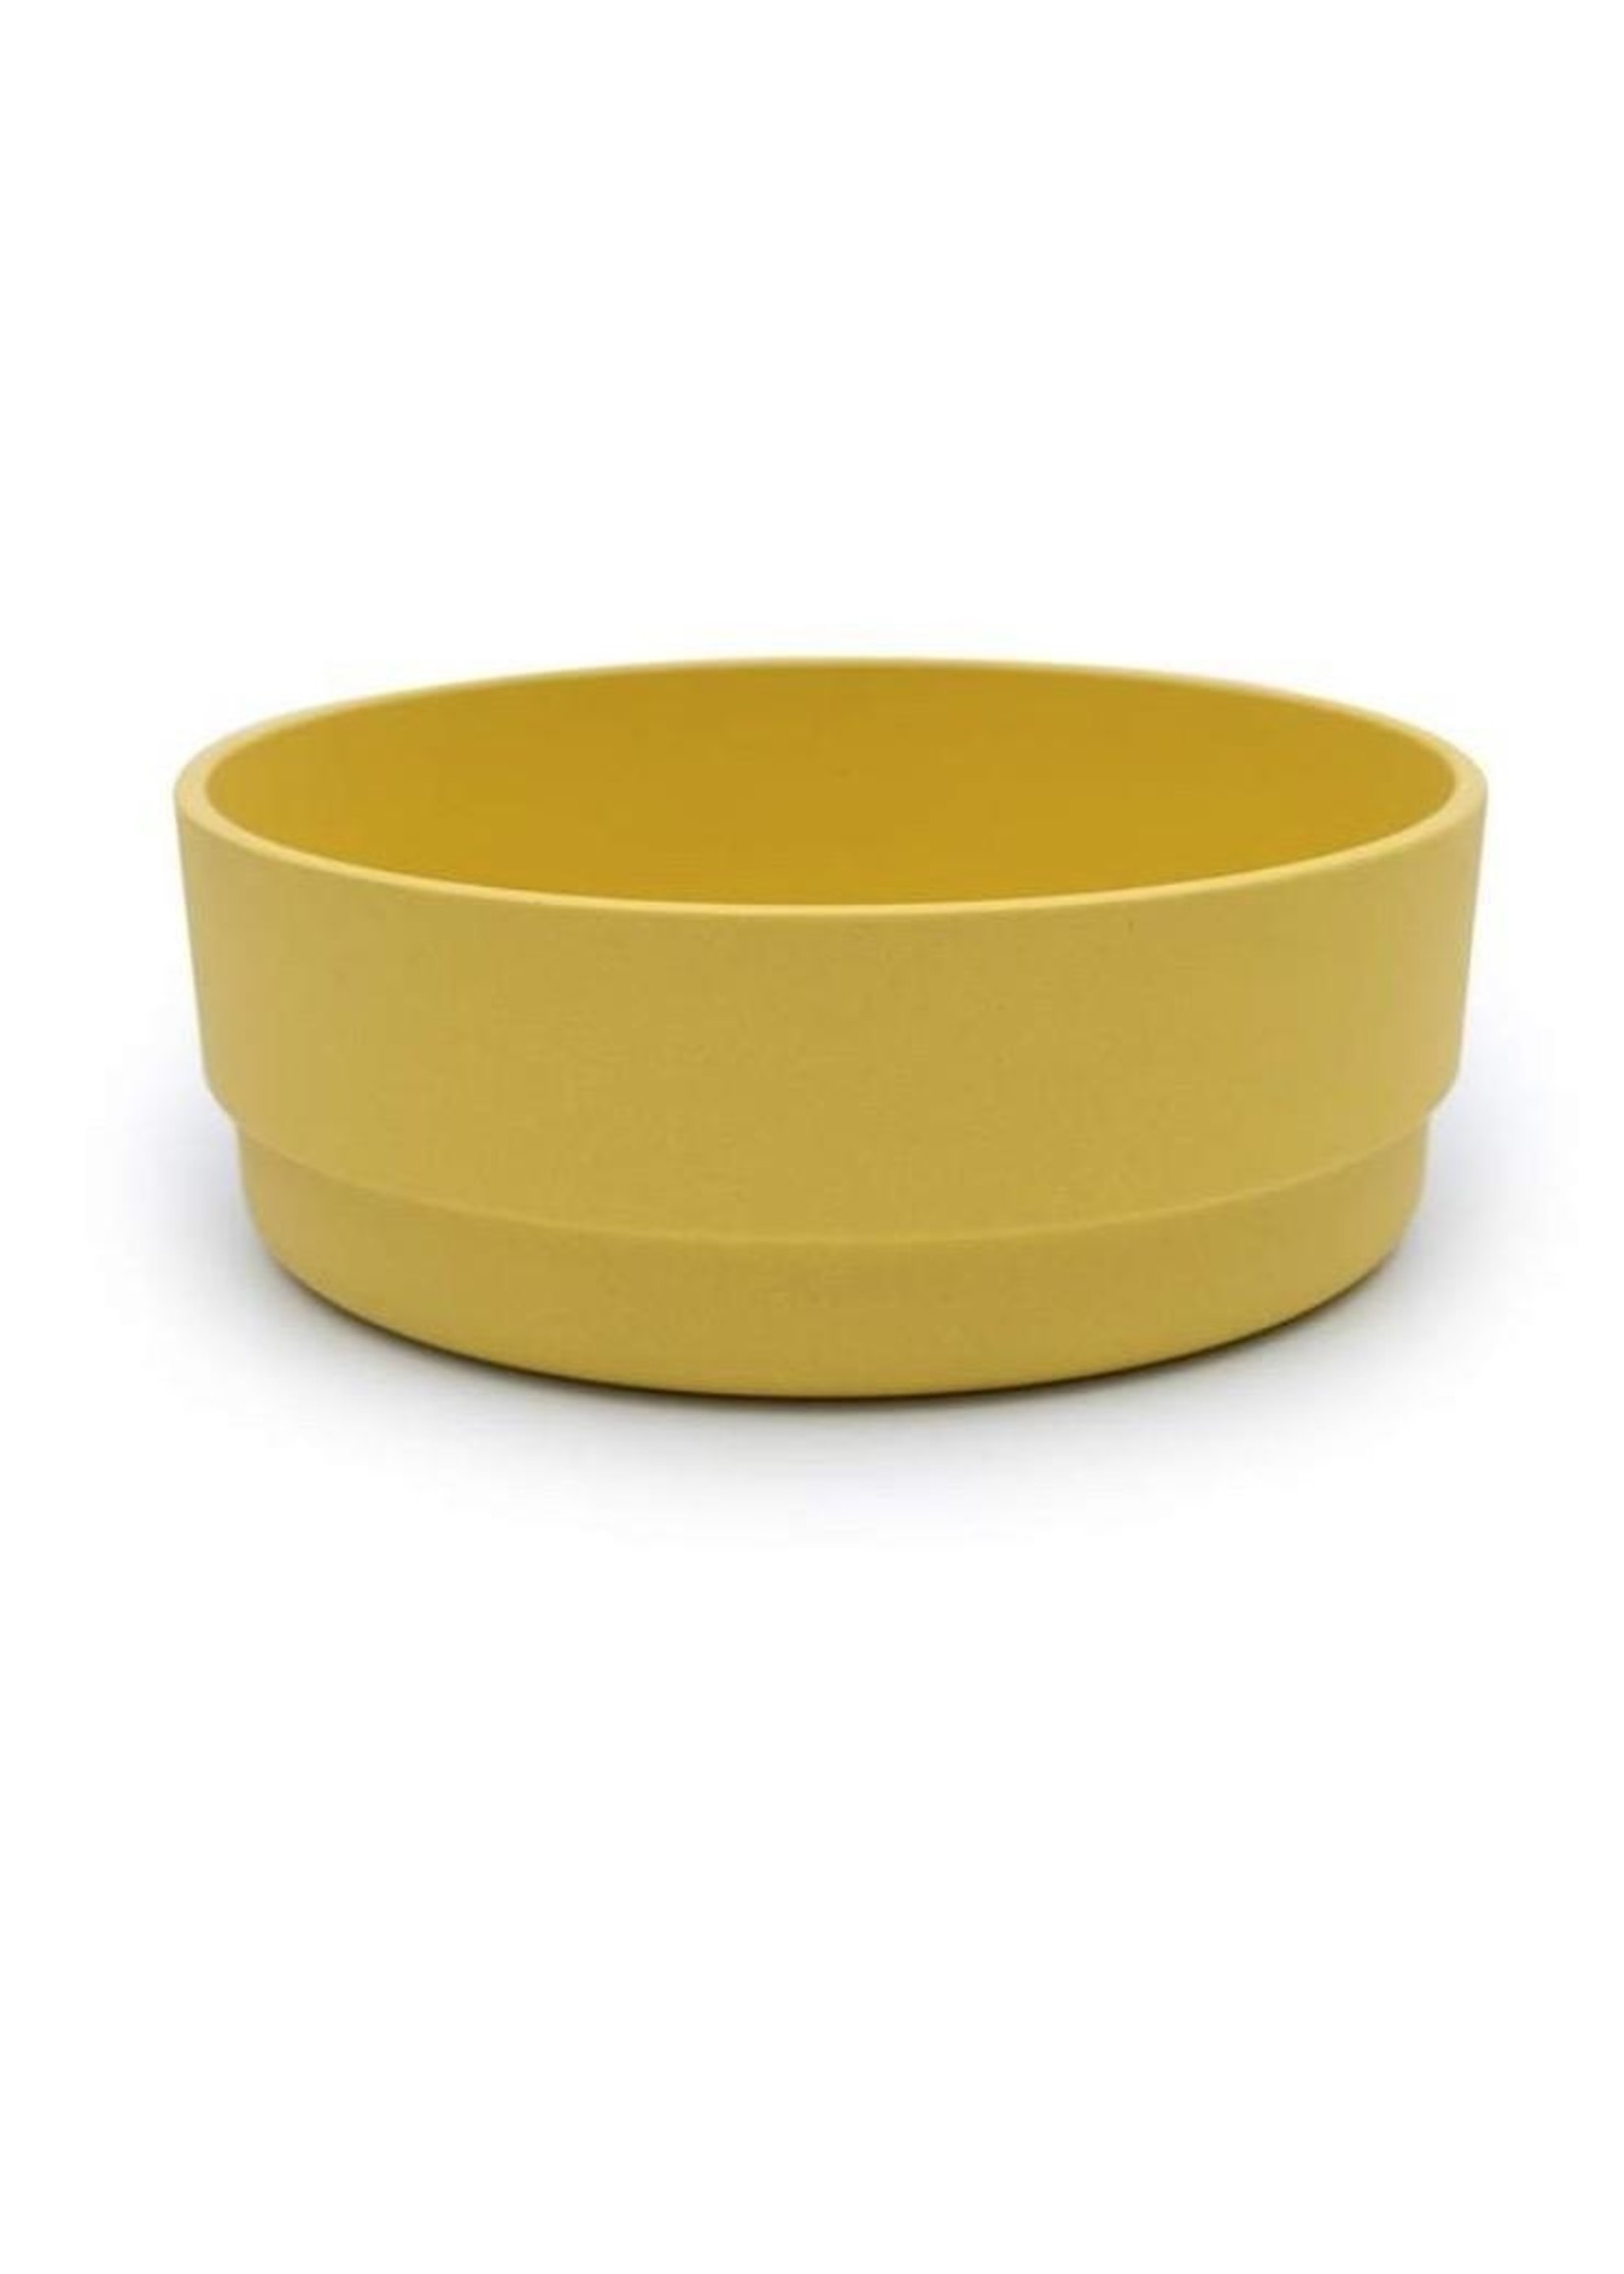 Bobo & Boo Bobo & Boo Plant-Based Bowl